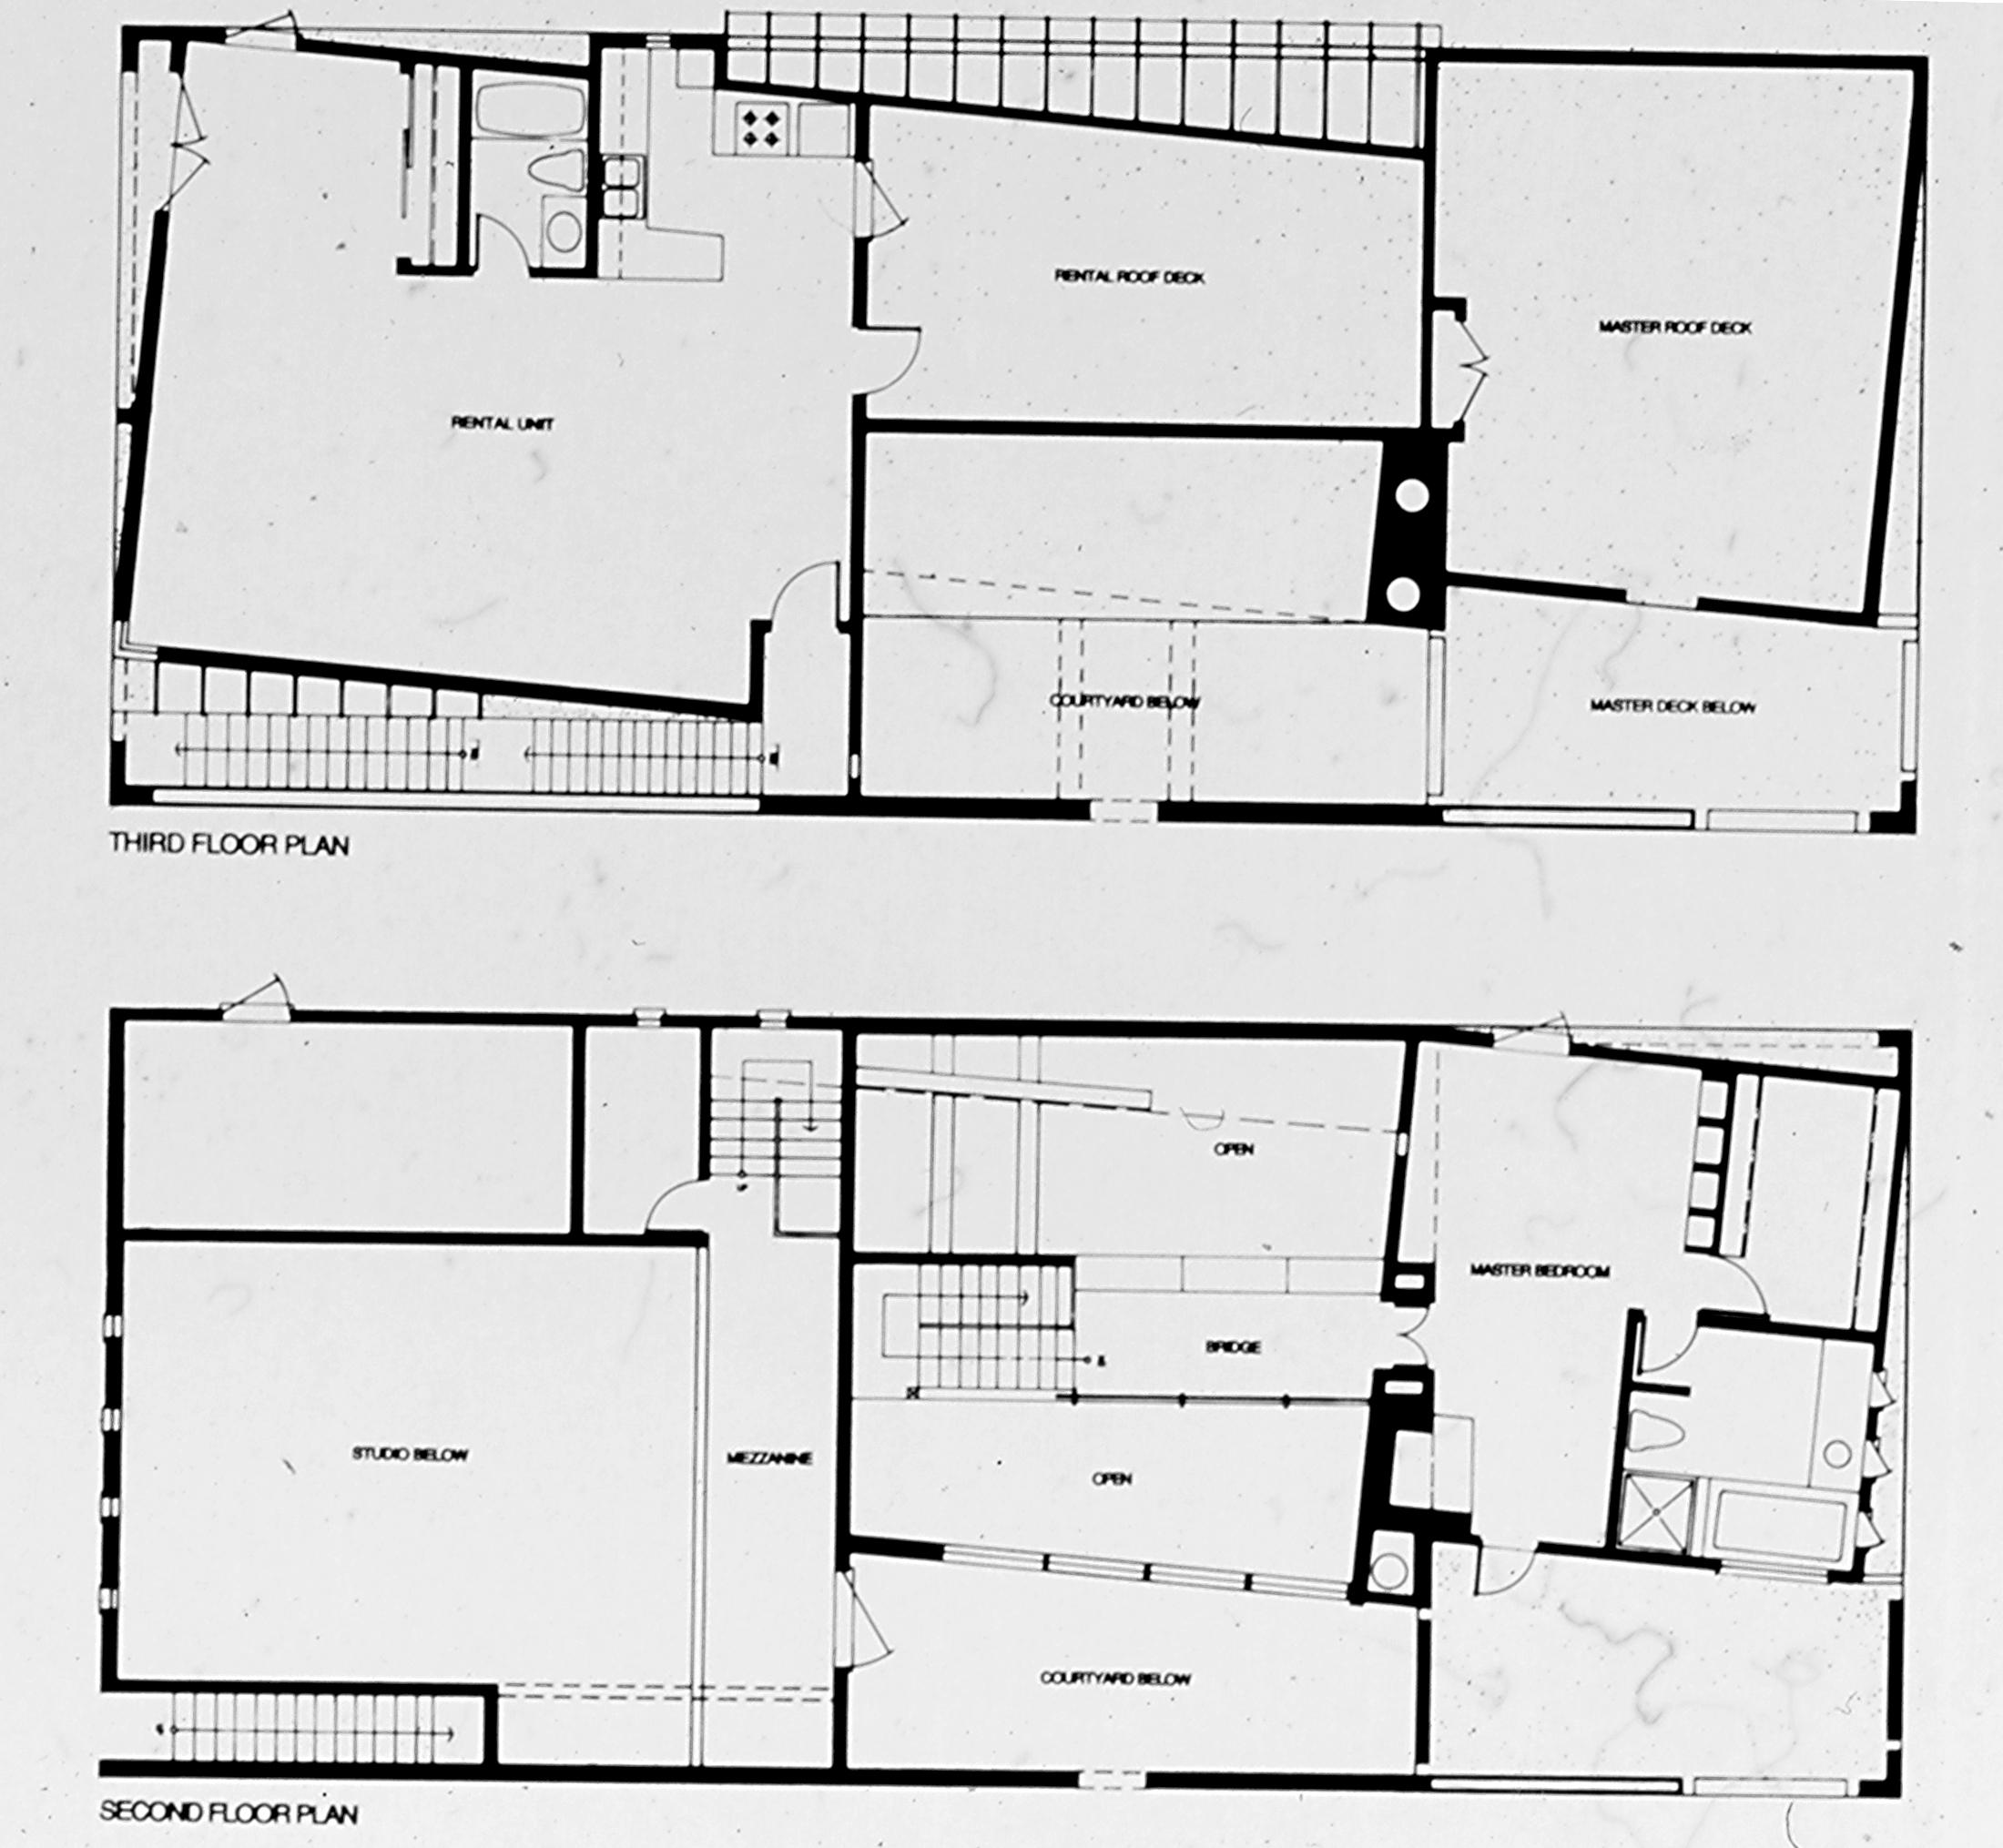 S.E.A.-Studio-Environmental-Architecture-David-Hertz-FAIA-Venable-House-Venice-Beach-sustainable-regenerative-restorative-design-residential-contemporary-modern-passive-systems-recycled-wood-concrete-green-building-canal-beachhouse-studioea-drawing-2.jpg